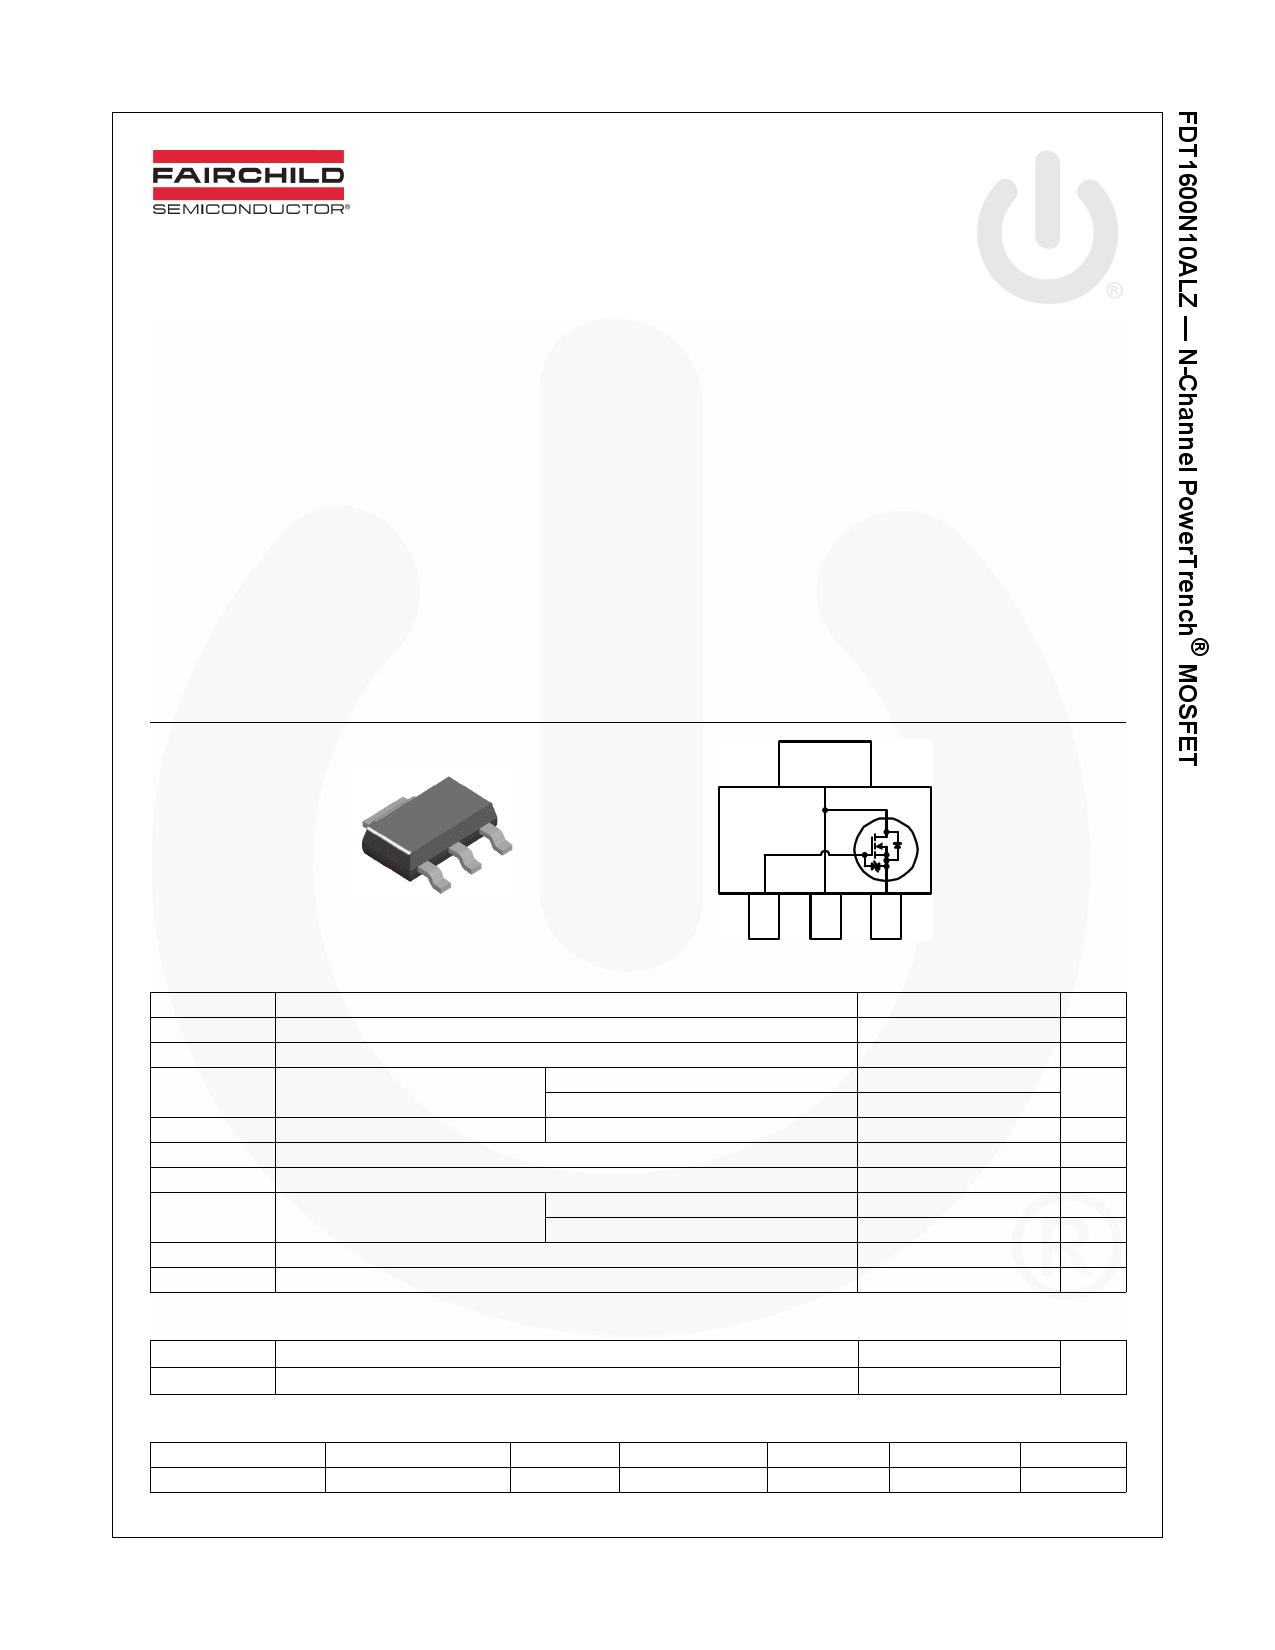 FDT1600N10ALZ 데이터시트 및 FDT1600N10ALZ PDF